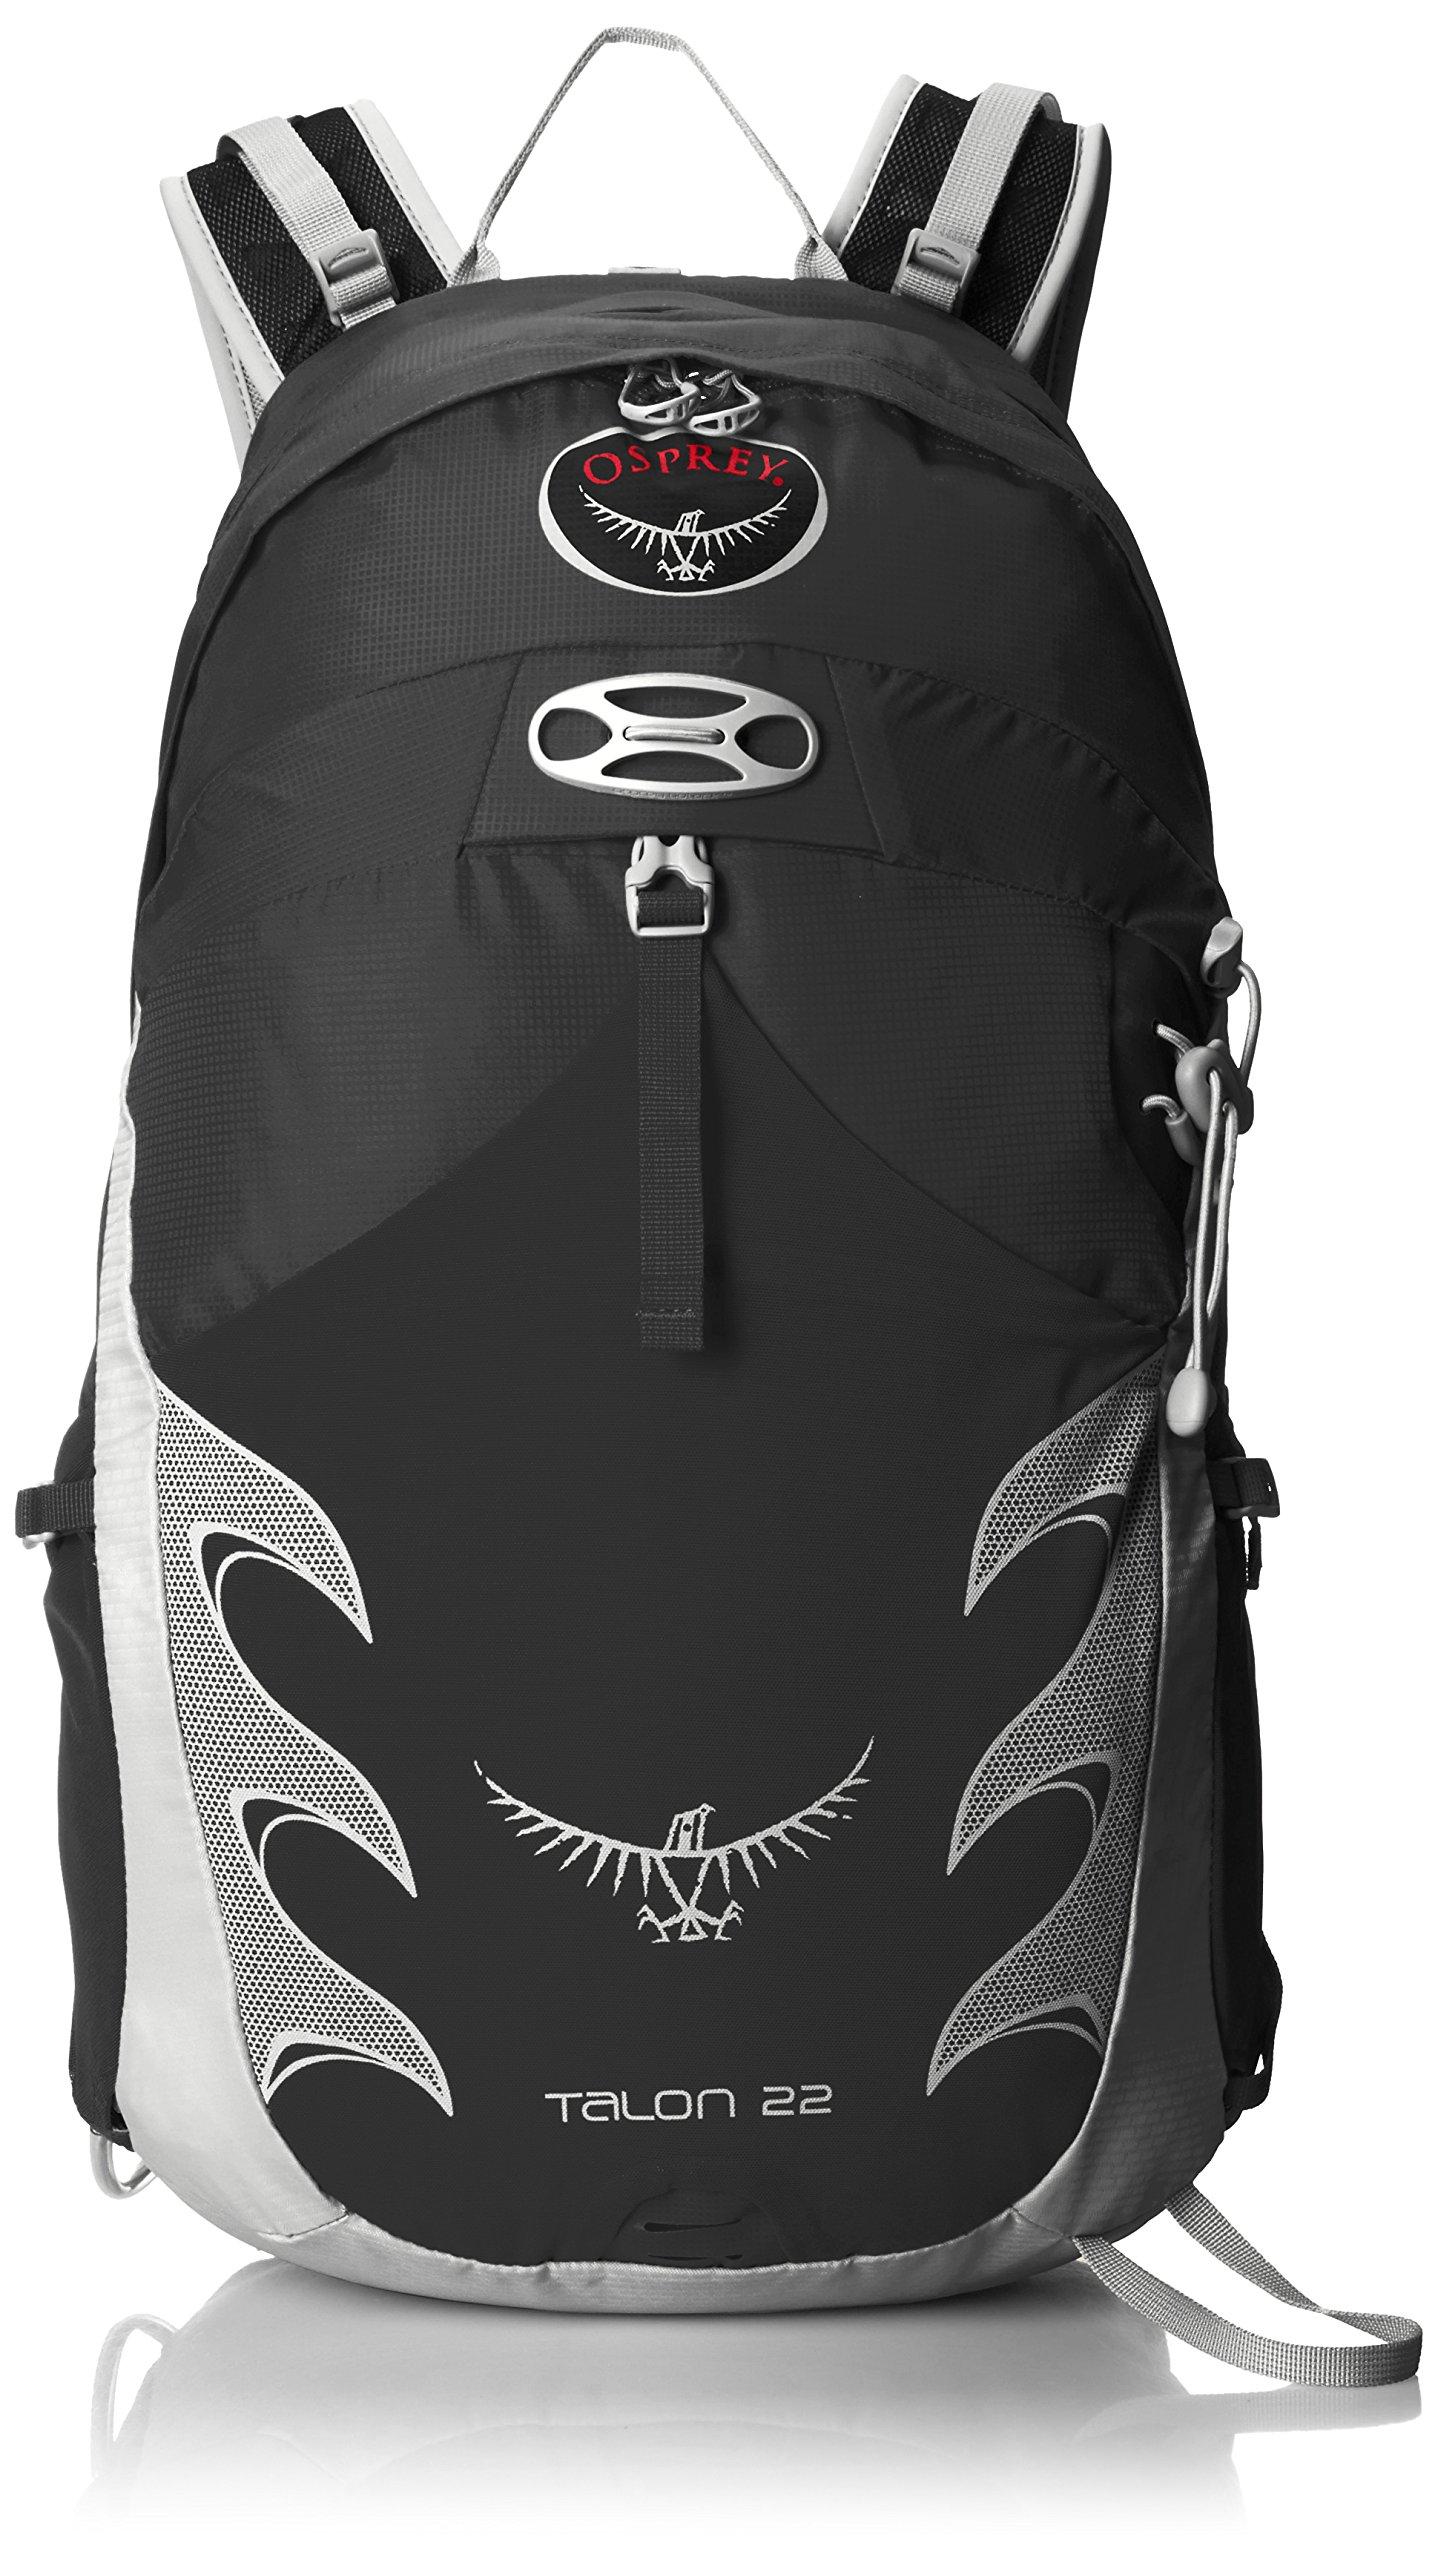 Osprey Packs Talon 22 Backpack 2016 Model, Onyx Black, Small/Medium